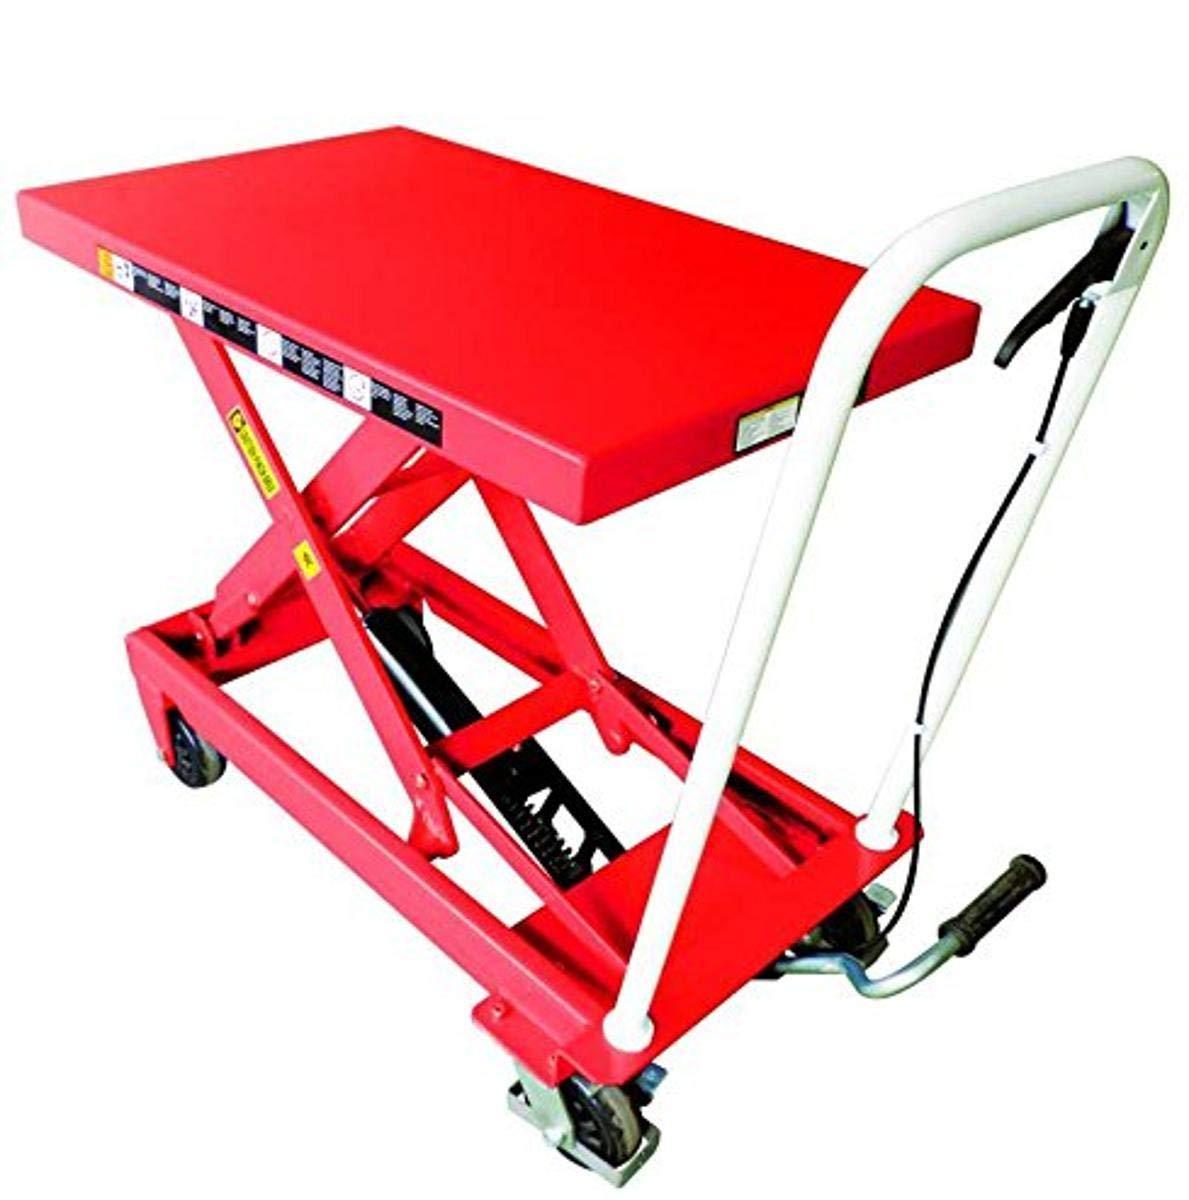 Giant Move Lawn Mower Orange Heavy Duty 500 Lb Lift Table